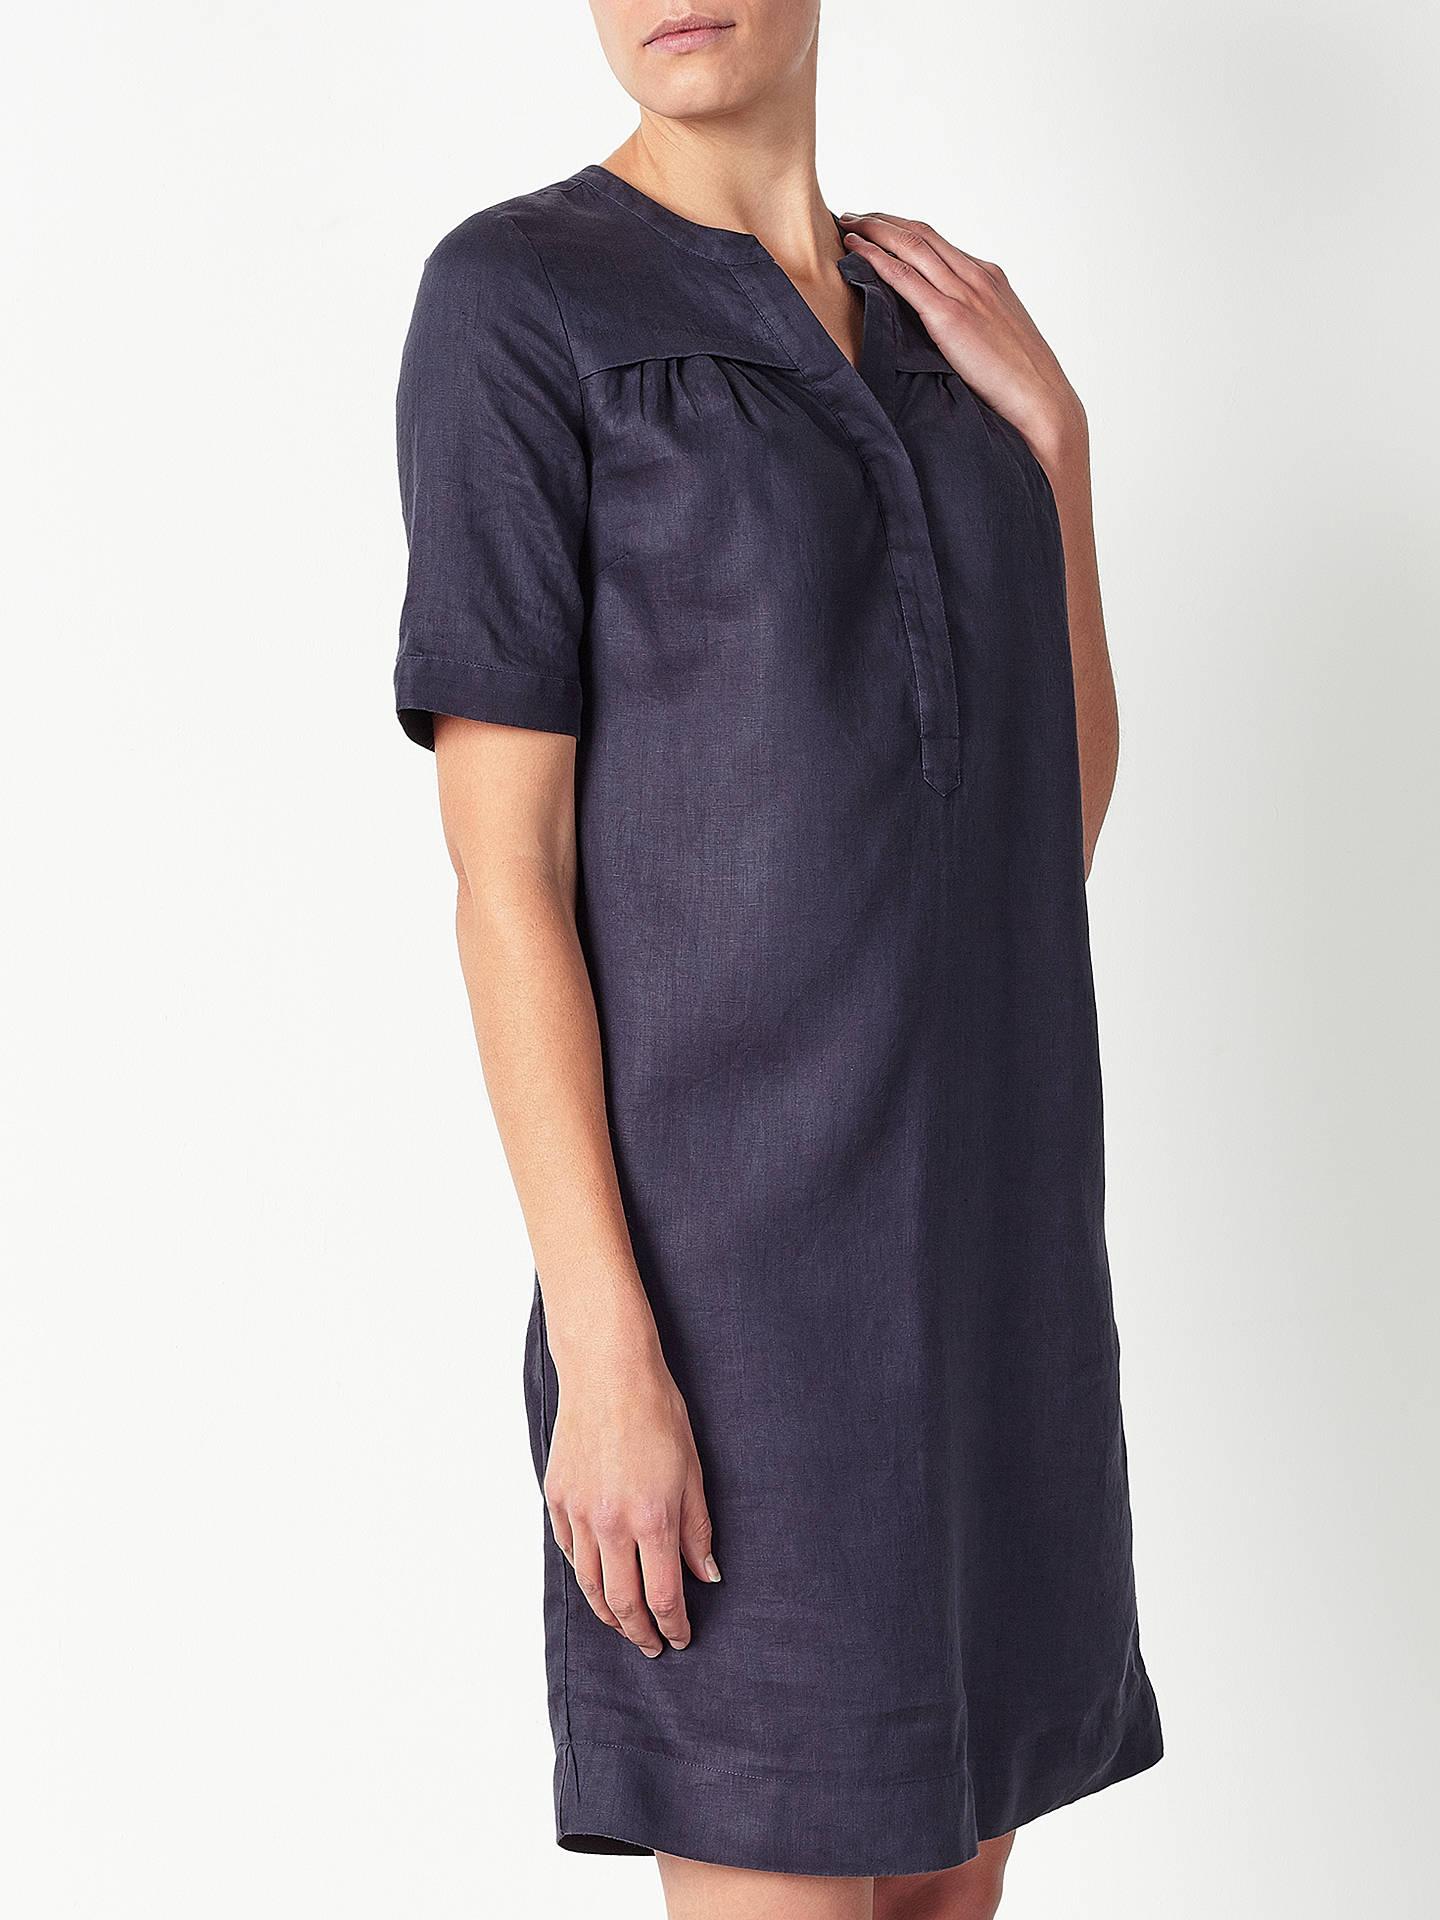 4a280eb18b Buy John Lewis Linen Notch Neck Dress, Navy, 8 Online at johnlewis.com ...